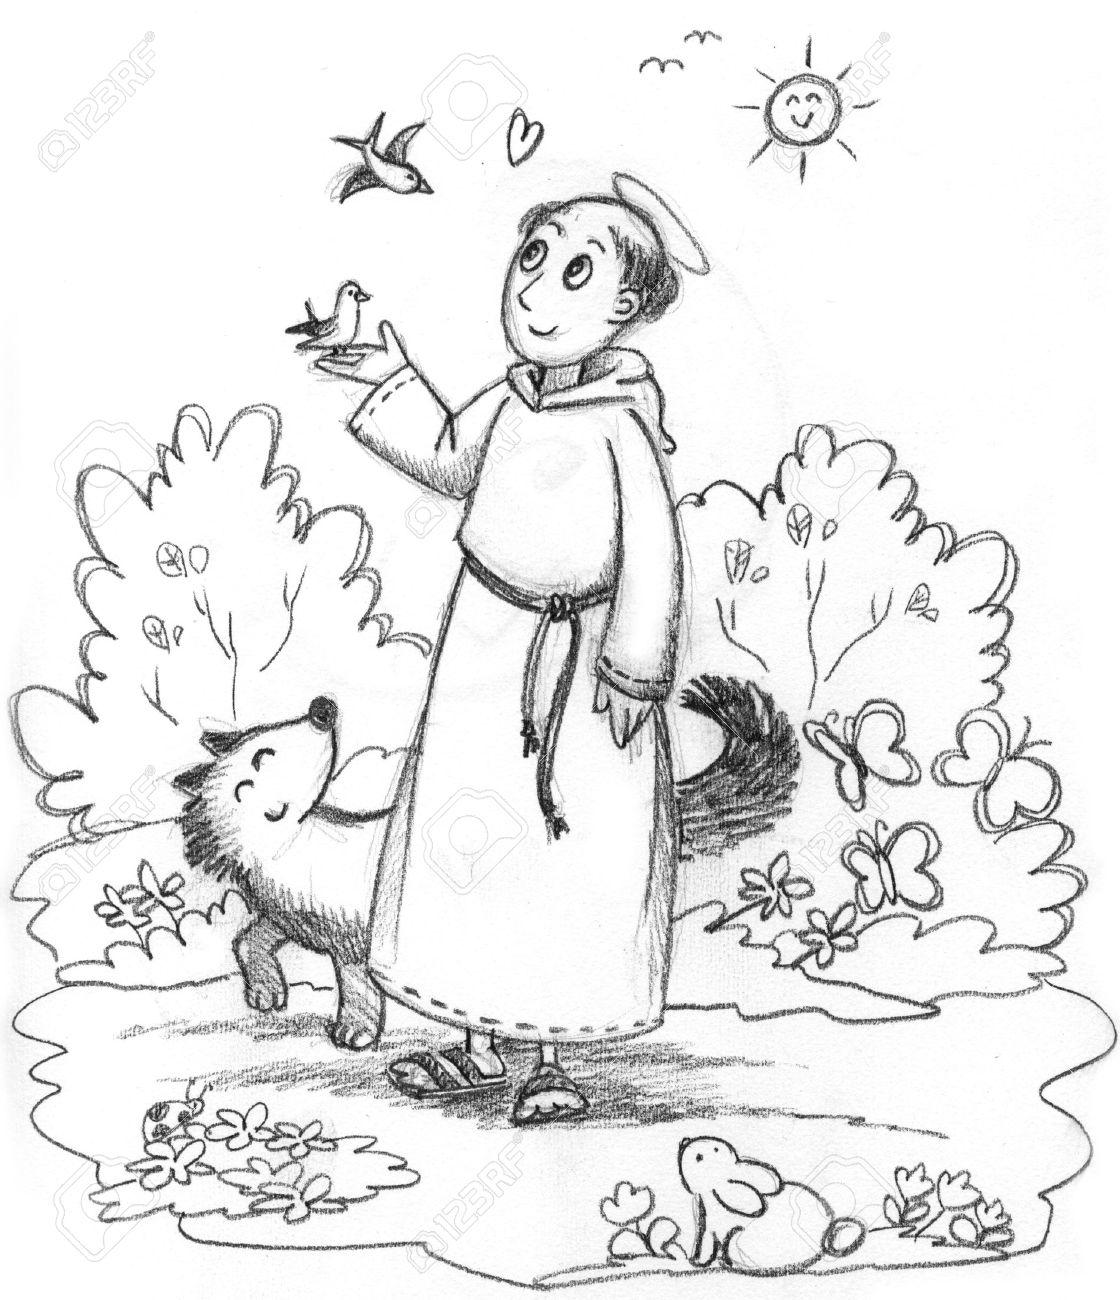 Estremamente Disegni Di San Francesco D Assisi Da Colorare AE36 » Regardsdefemmes ZW12